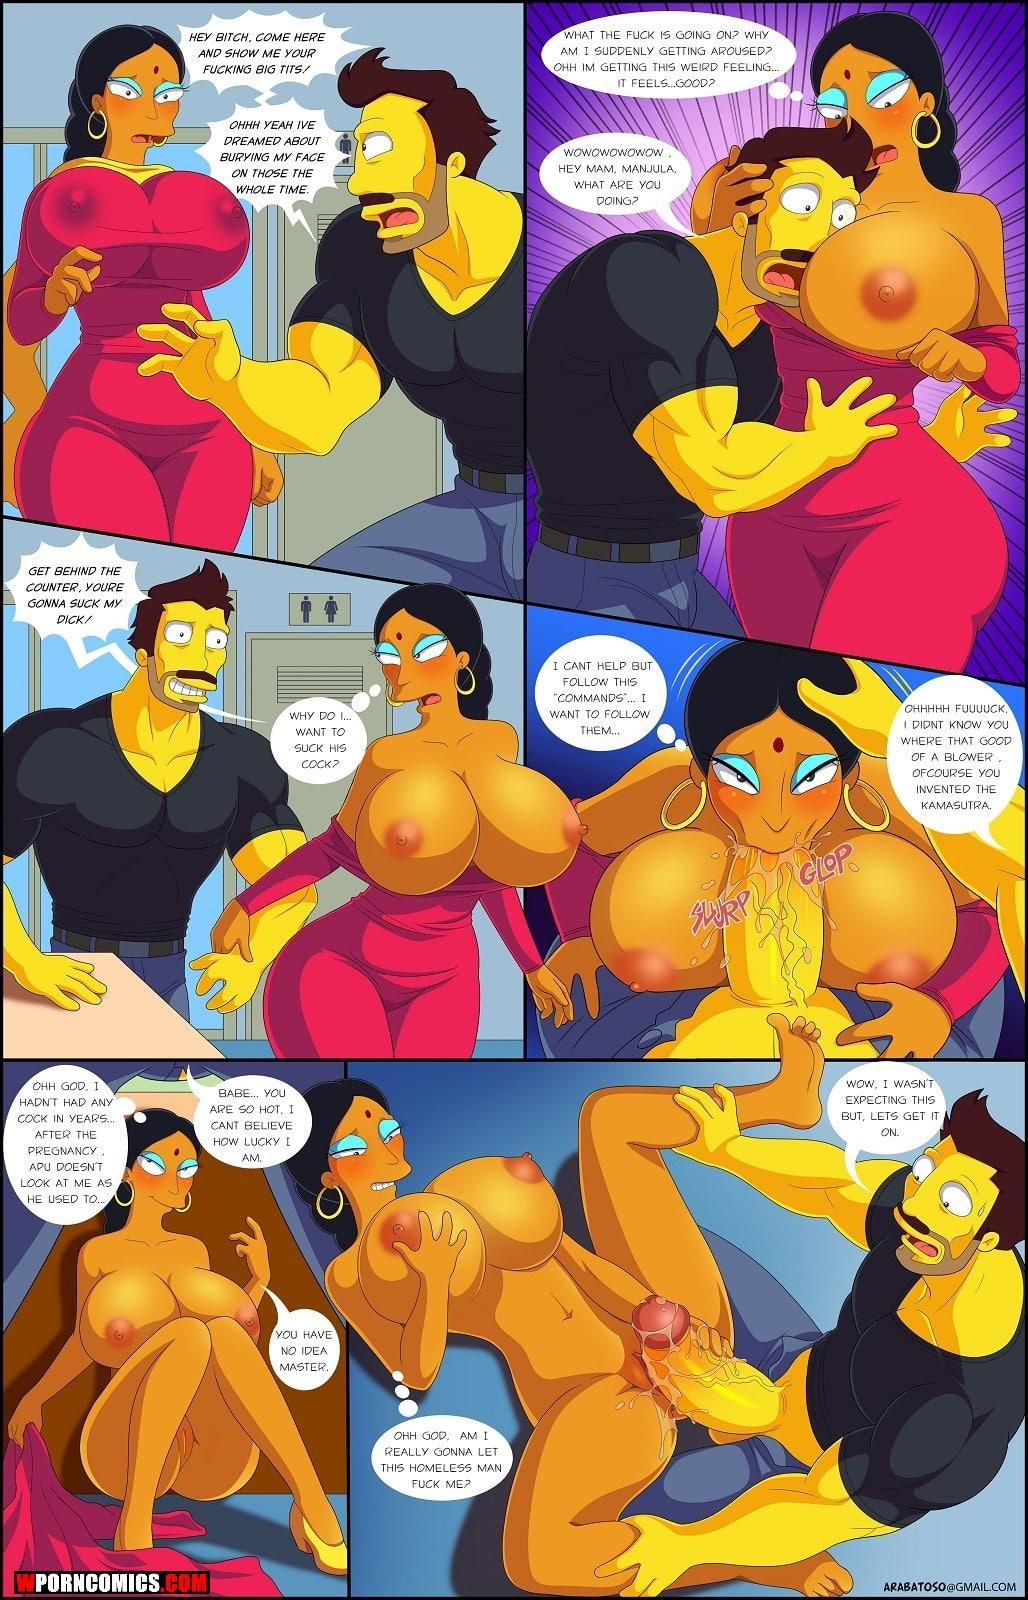 porn-comic-simpsons-darrens-adventure-part-2-2020-03-21/porn-comic-simpsons-darrens-adventure-part-2-2020-03-21-20620.jpg